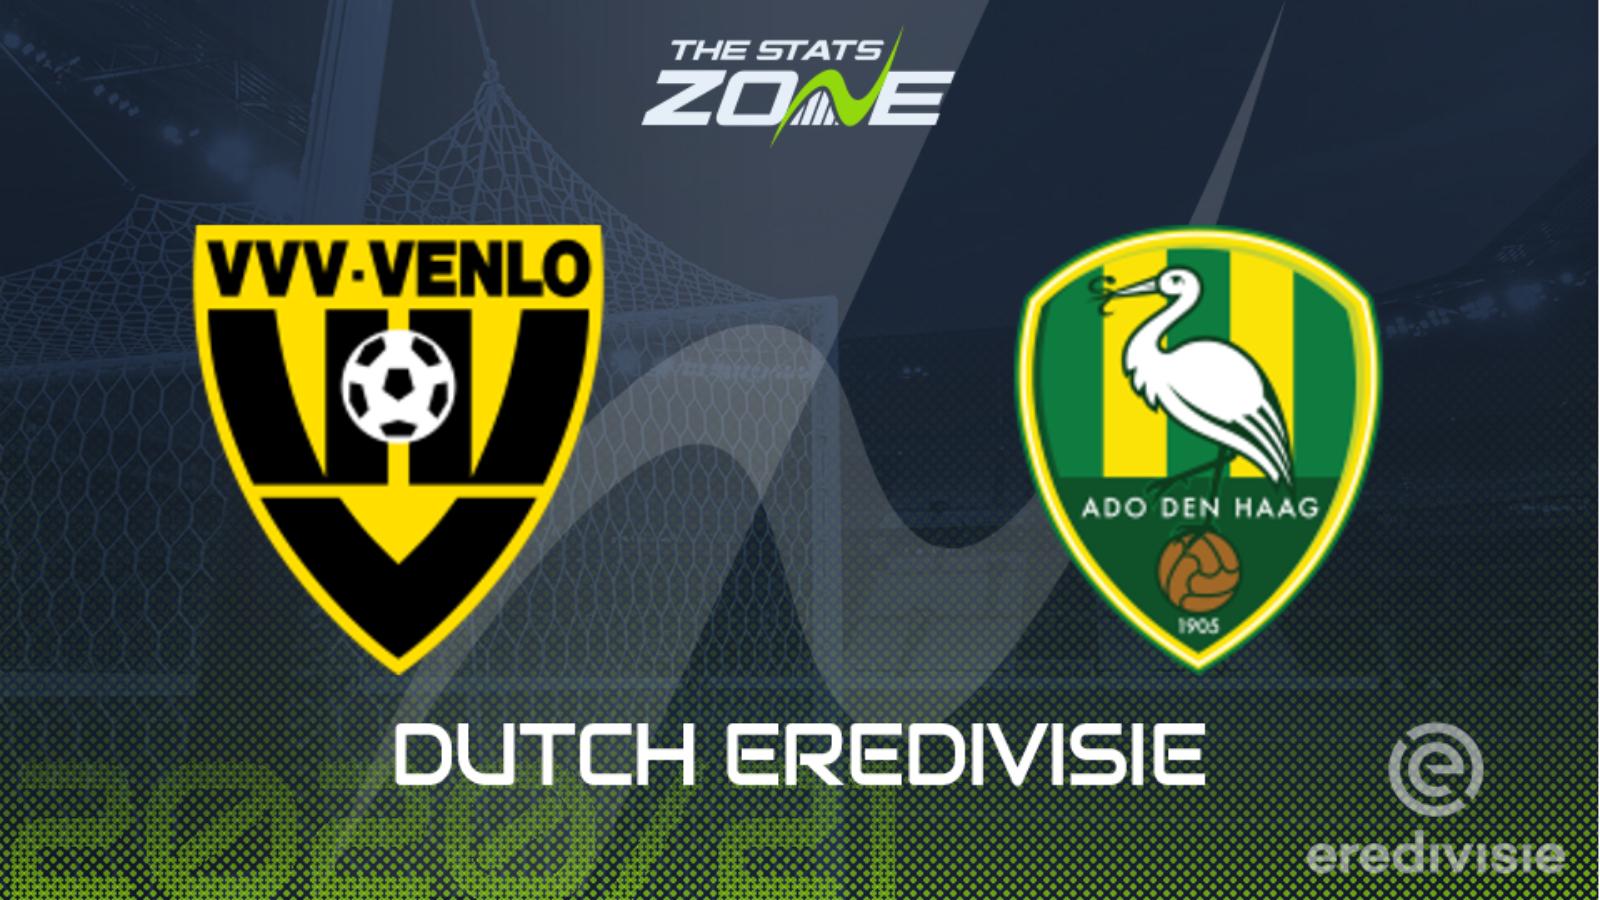 2020 21 Eredivisie Vvv Vs Ado Den Haag Preview Prediction The Stats Zone